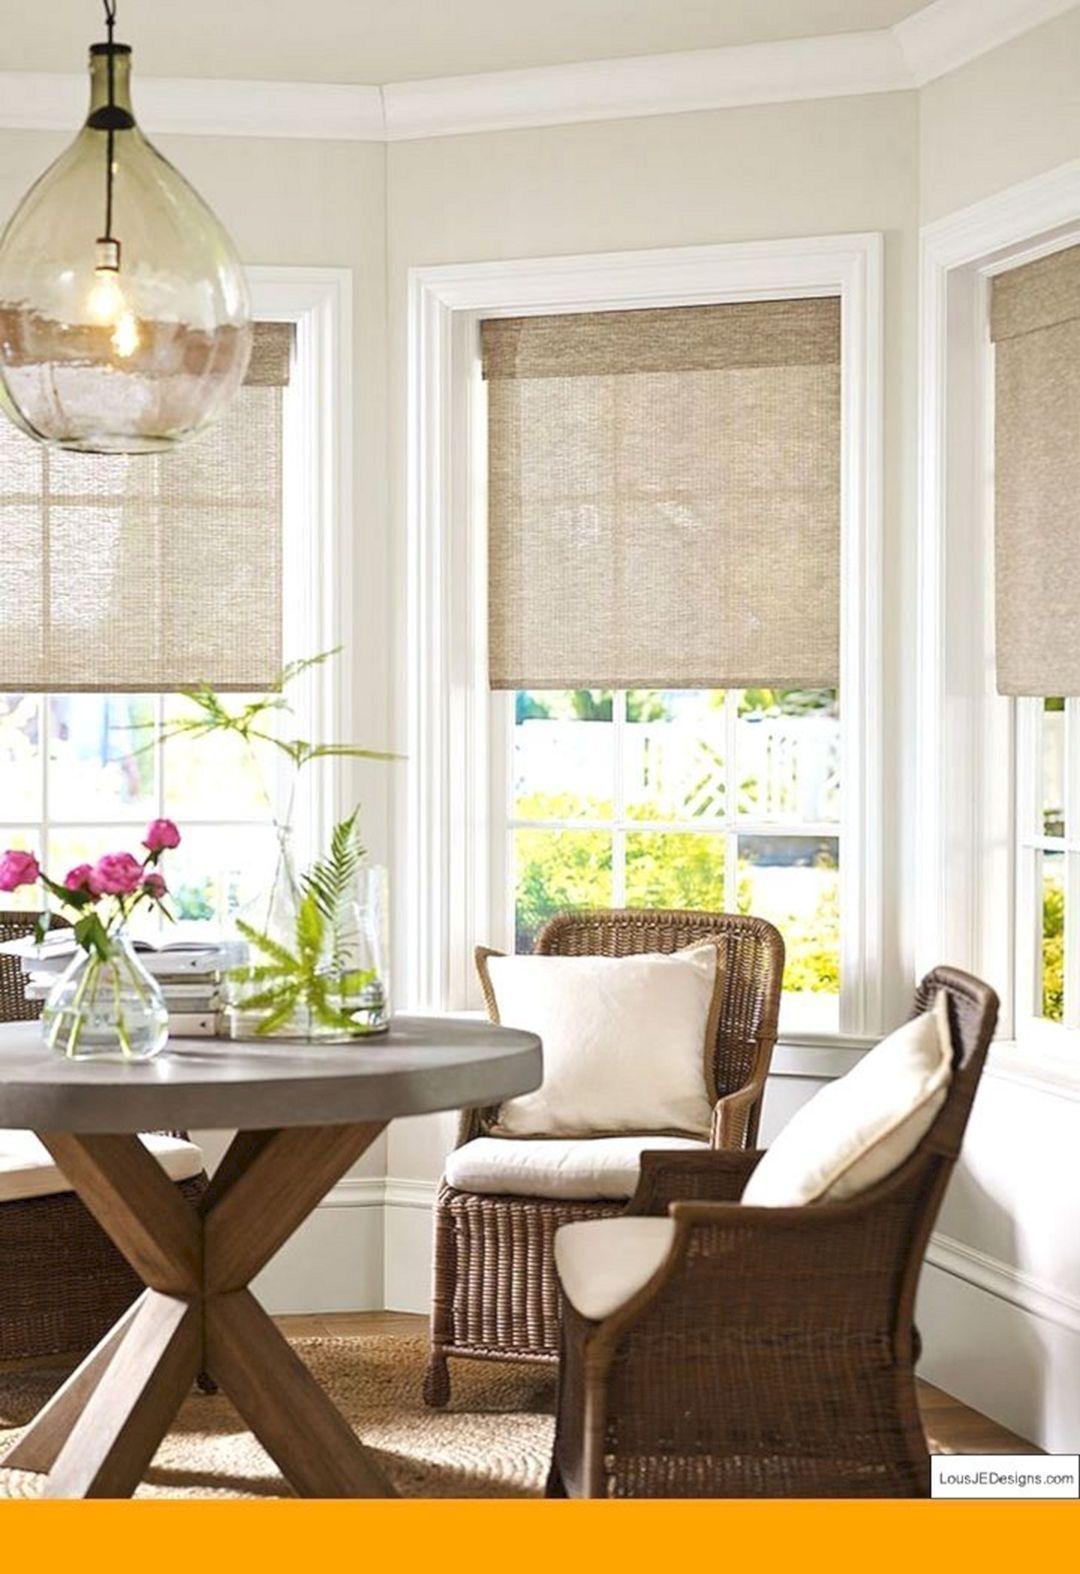 Pin By Amanda On Remodeling Ideas Living Room Windows Kitchen Bay Window Farmhouse Window Treatments